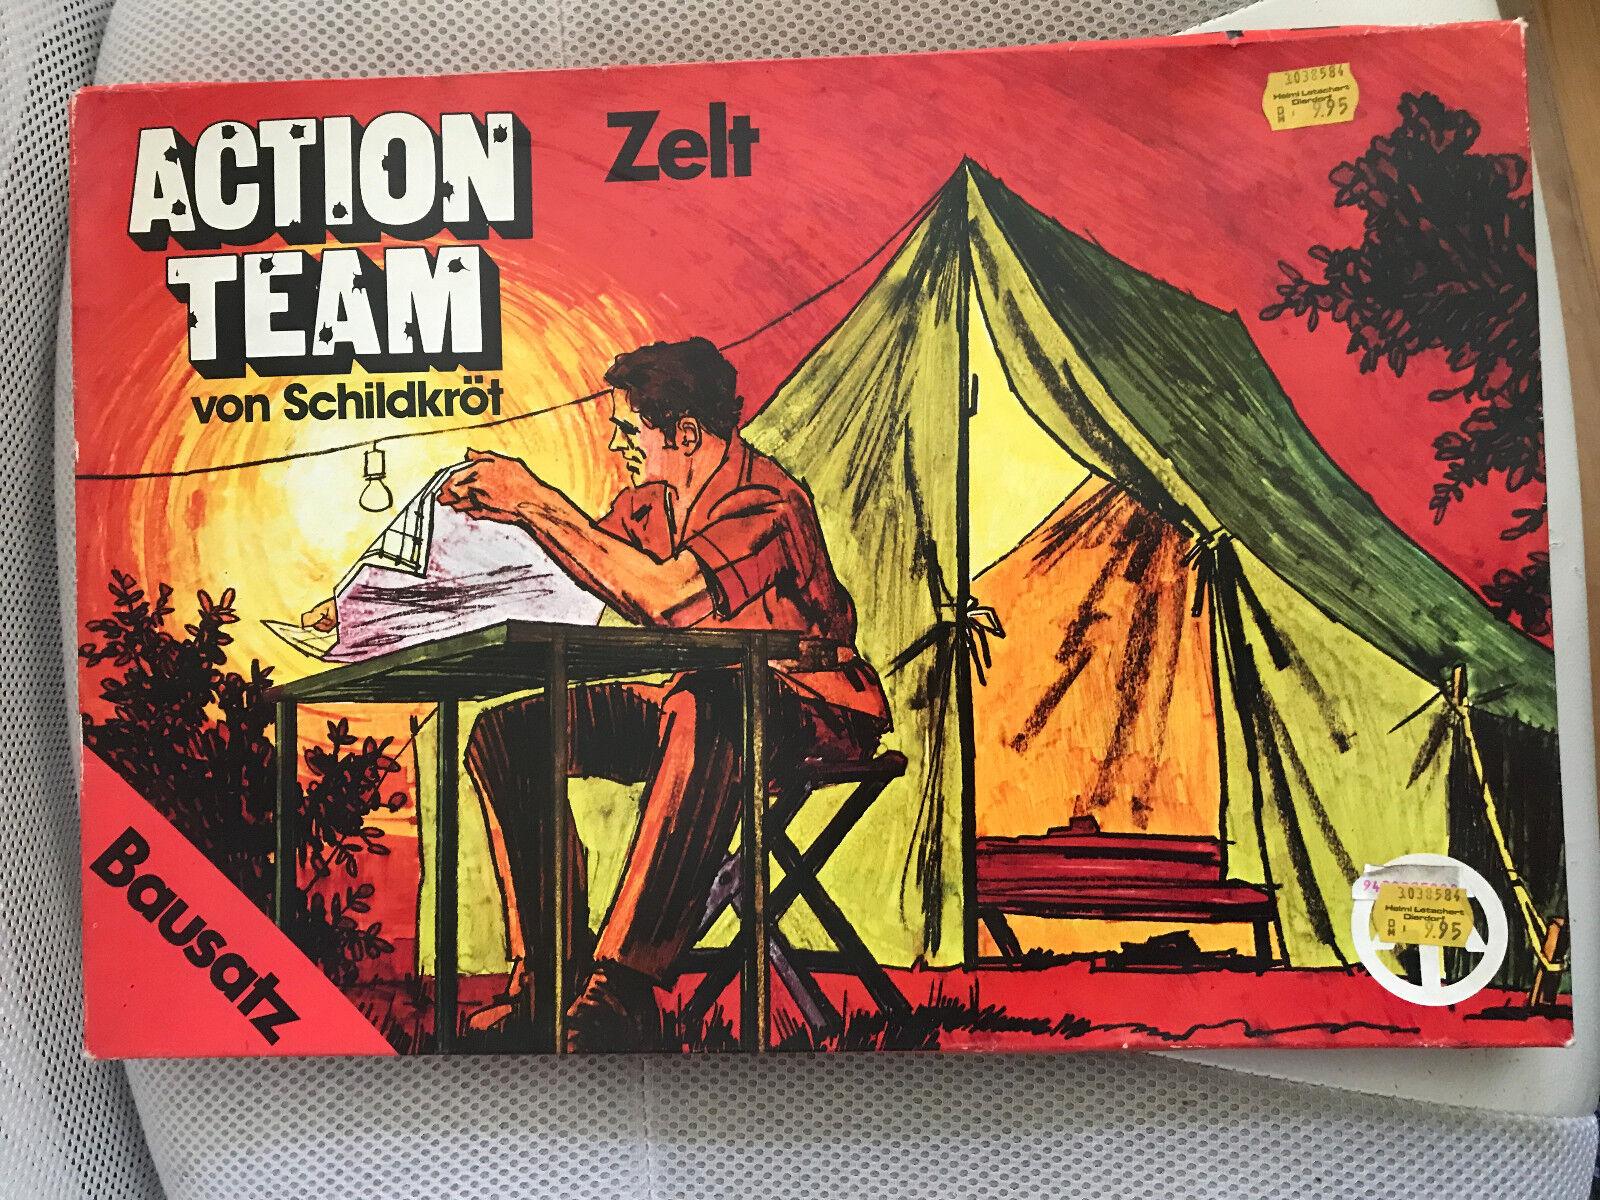 1970 moc gi joe action team - mann - zelt hasbro   634146